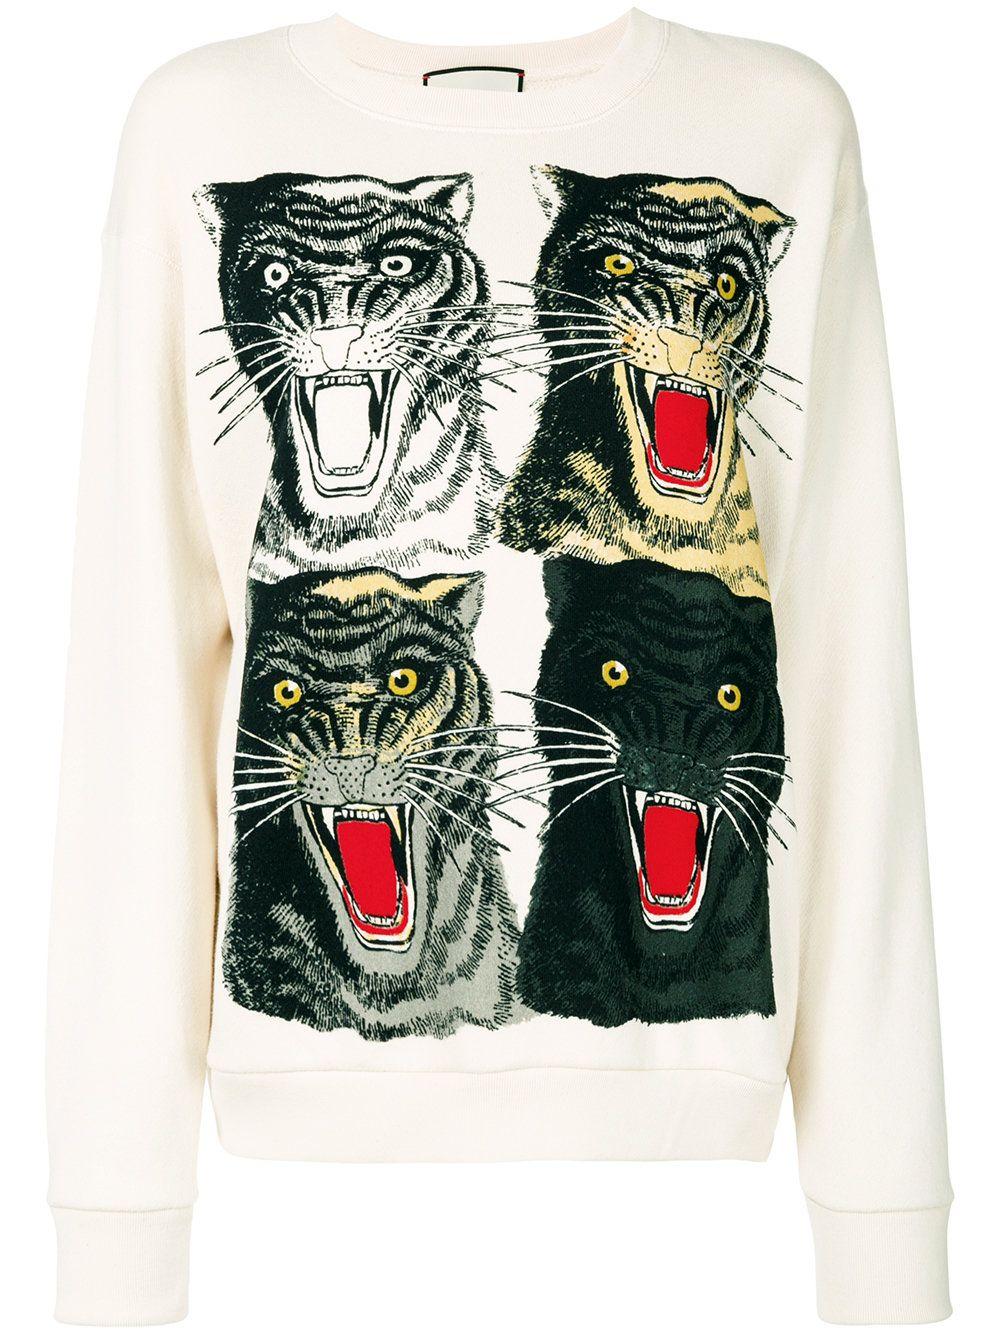 Gucci Tiger Face Oversized Sweatshirt Sweatshirts Long Sleeve Cotton Tops Oversized Sweatshirt [ 1334 x 1000 Pixel ]